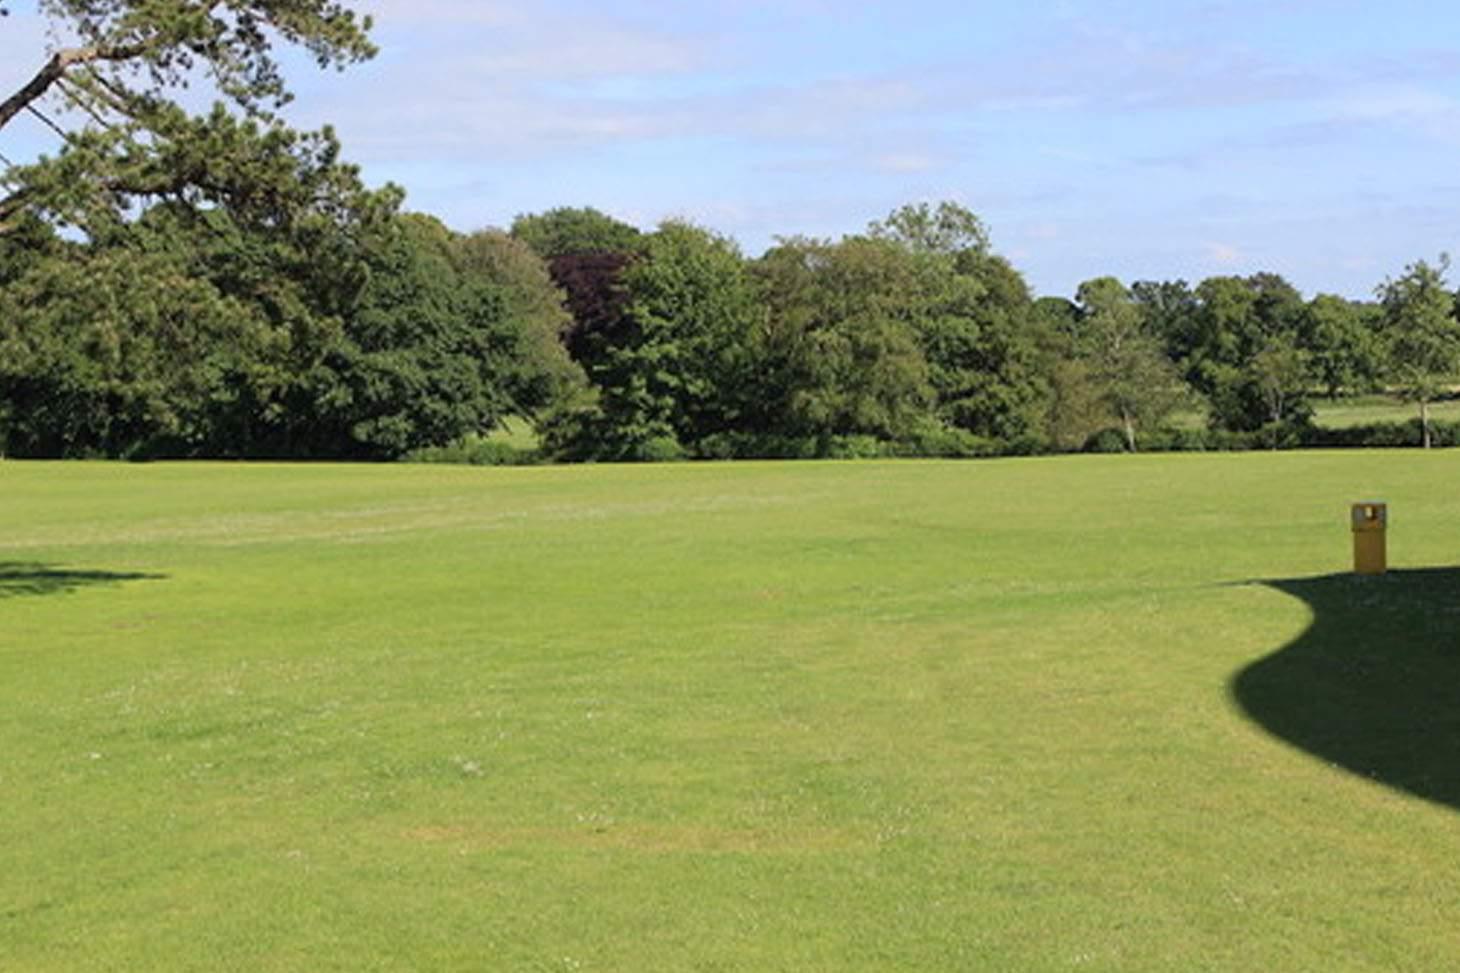 Garstang Community Academy 11 a side | Grass football pitch